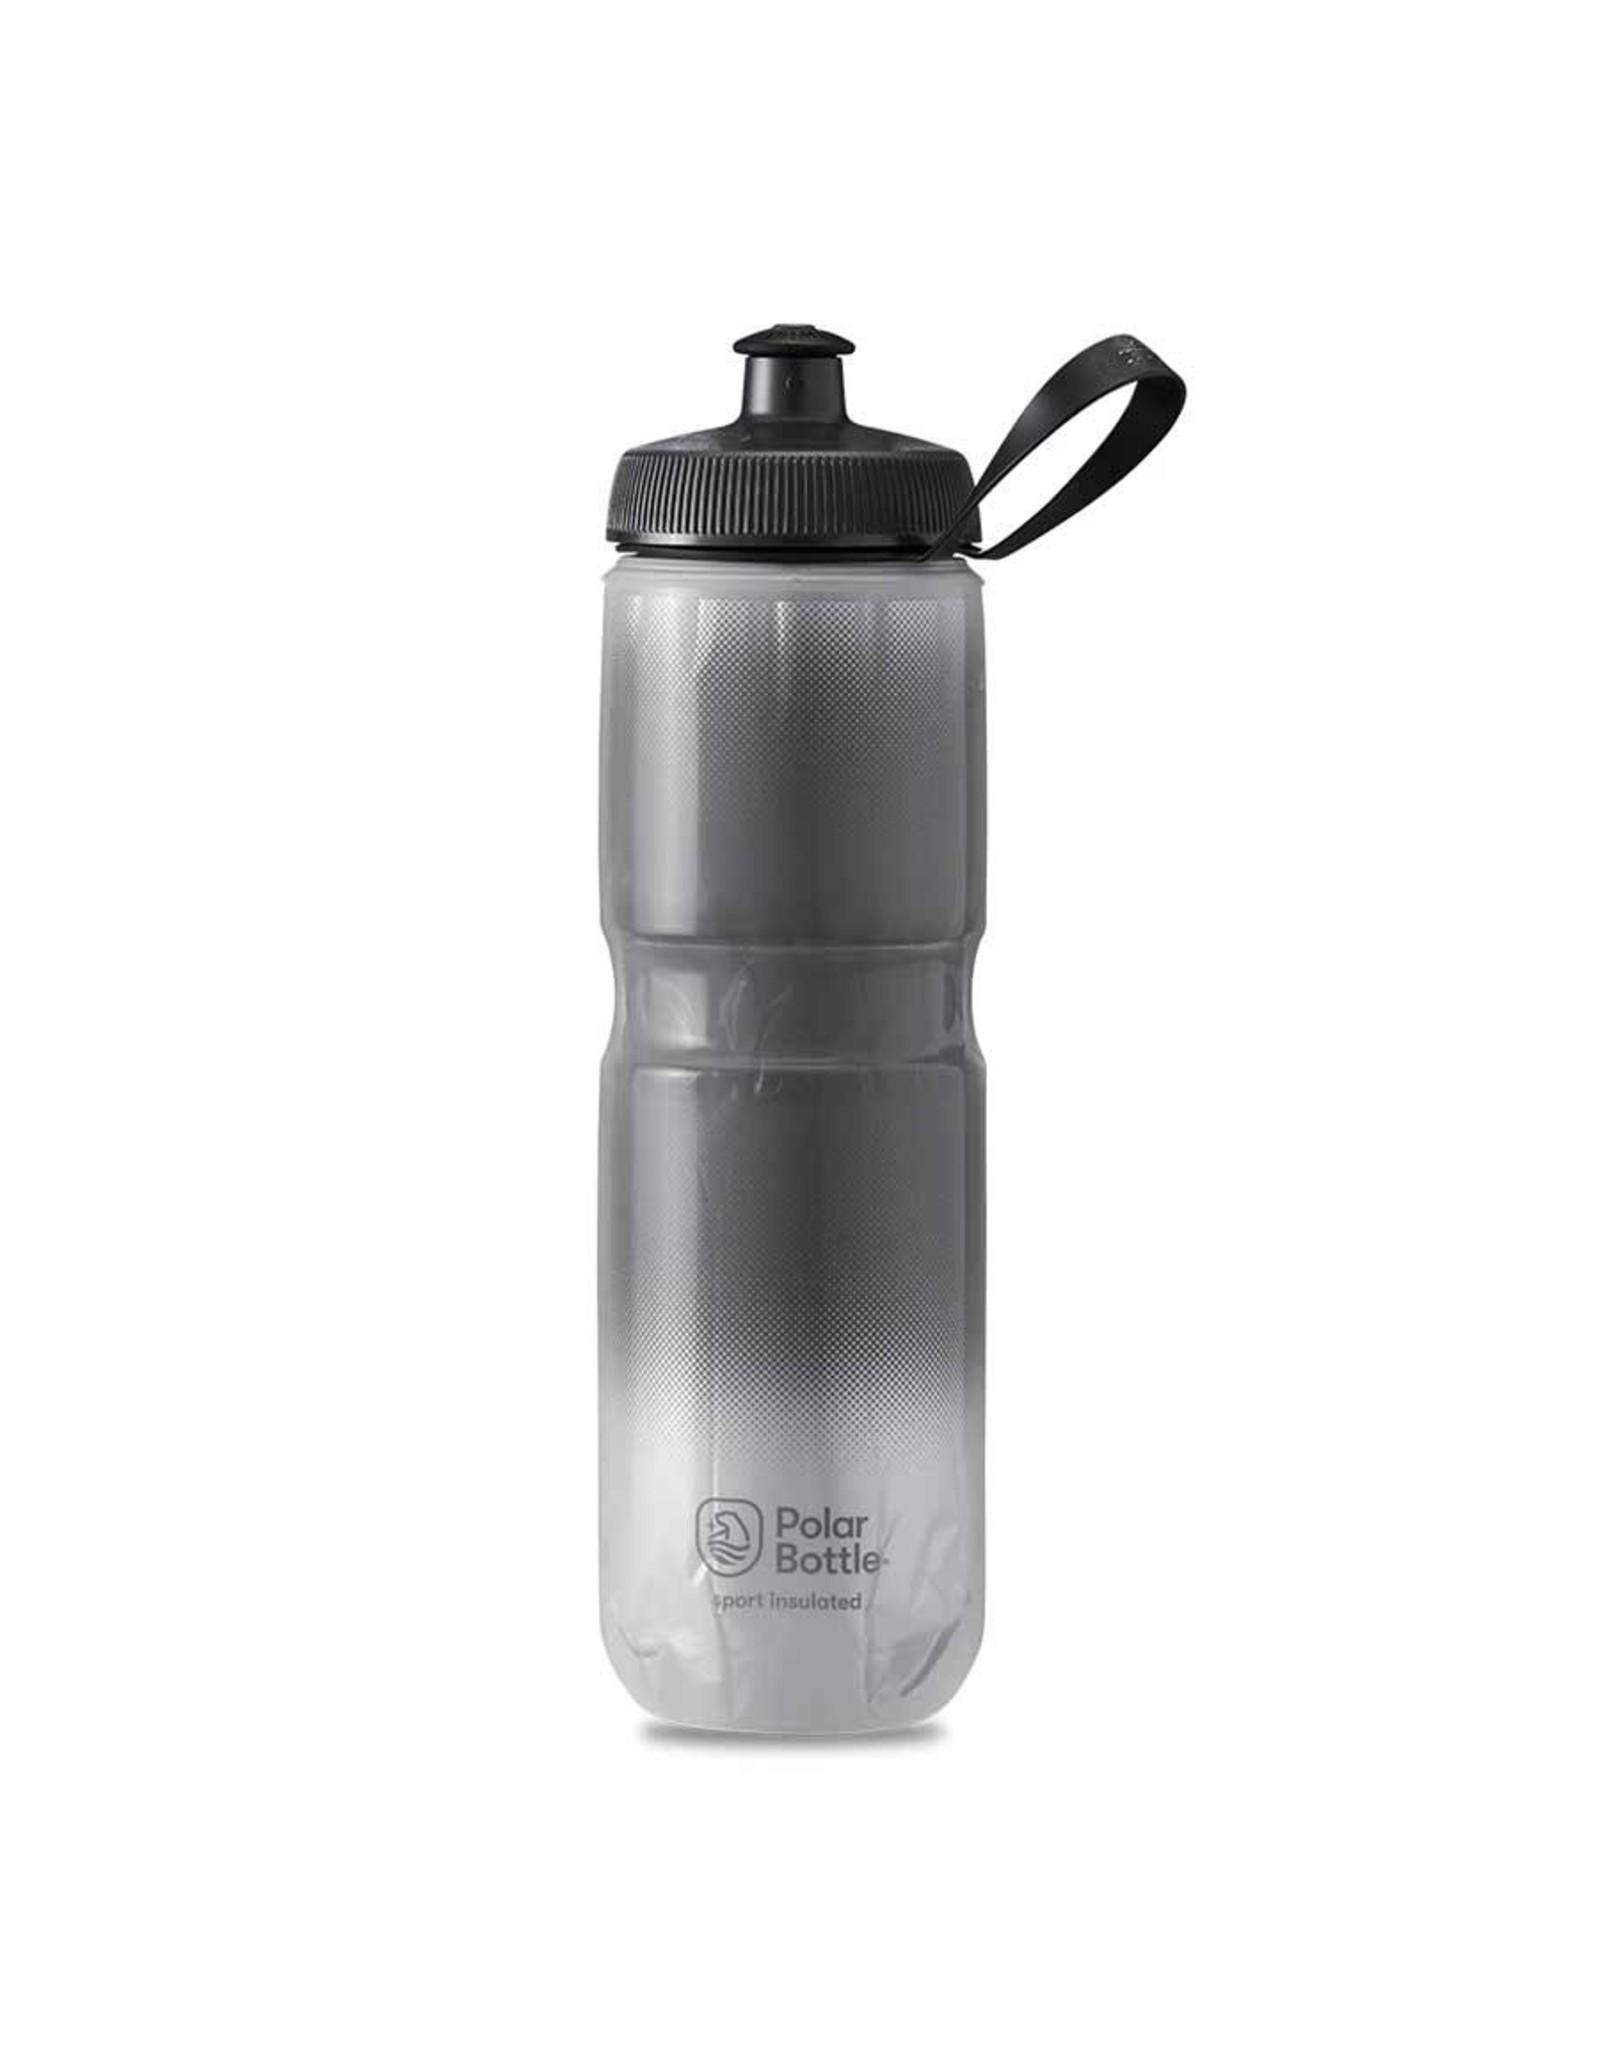 Polar Bottle Polar - Sport Insulated 24oz, Water Bottle, 710ml / 24oz, Charcoal/Silver